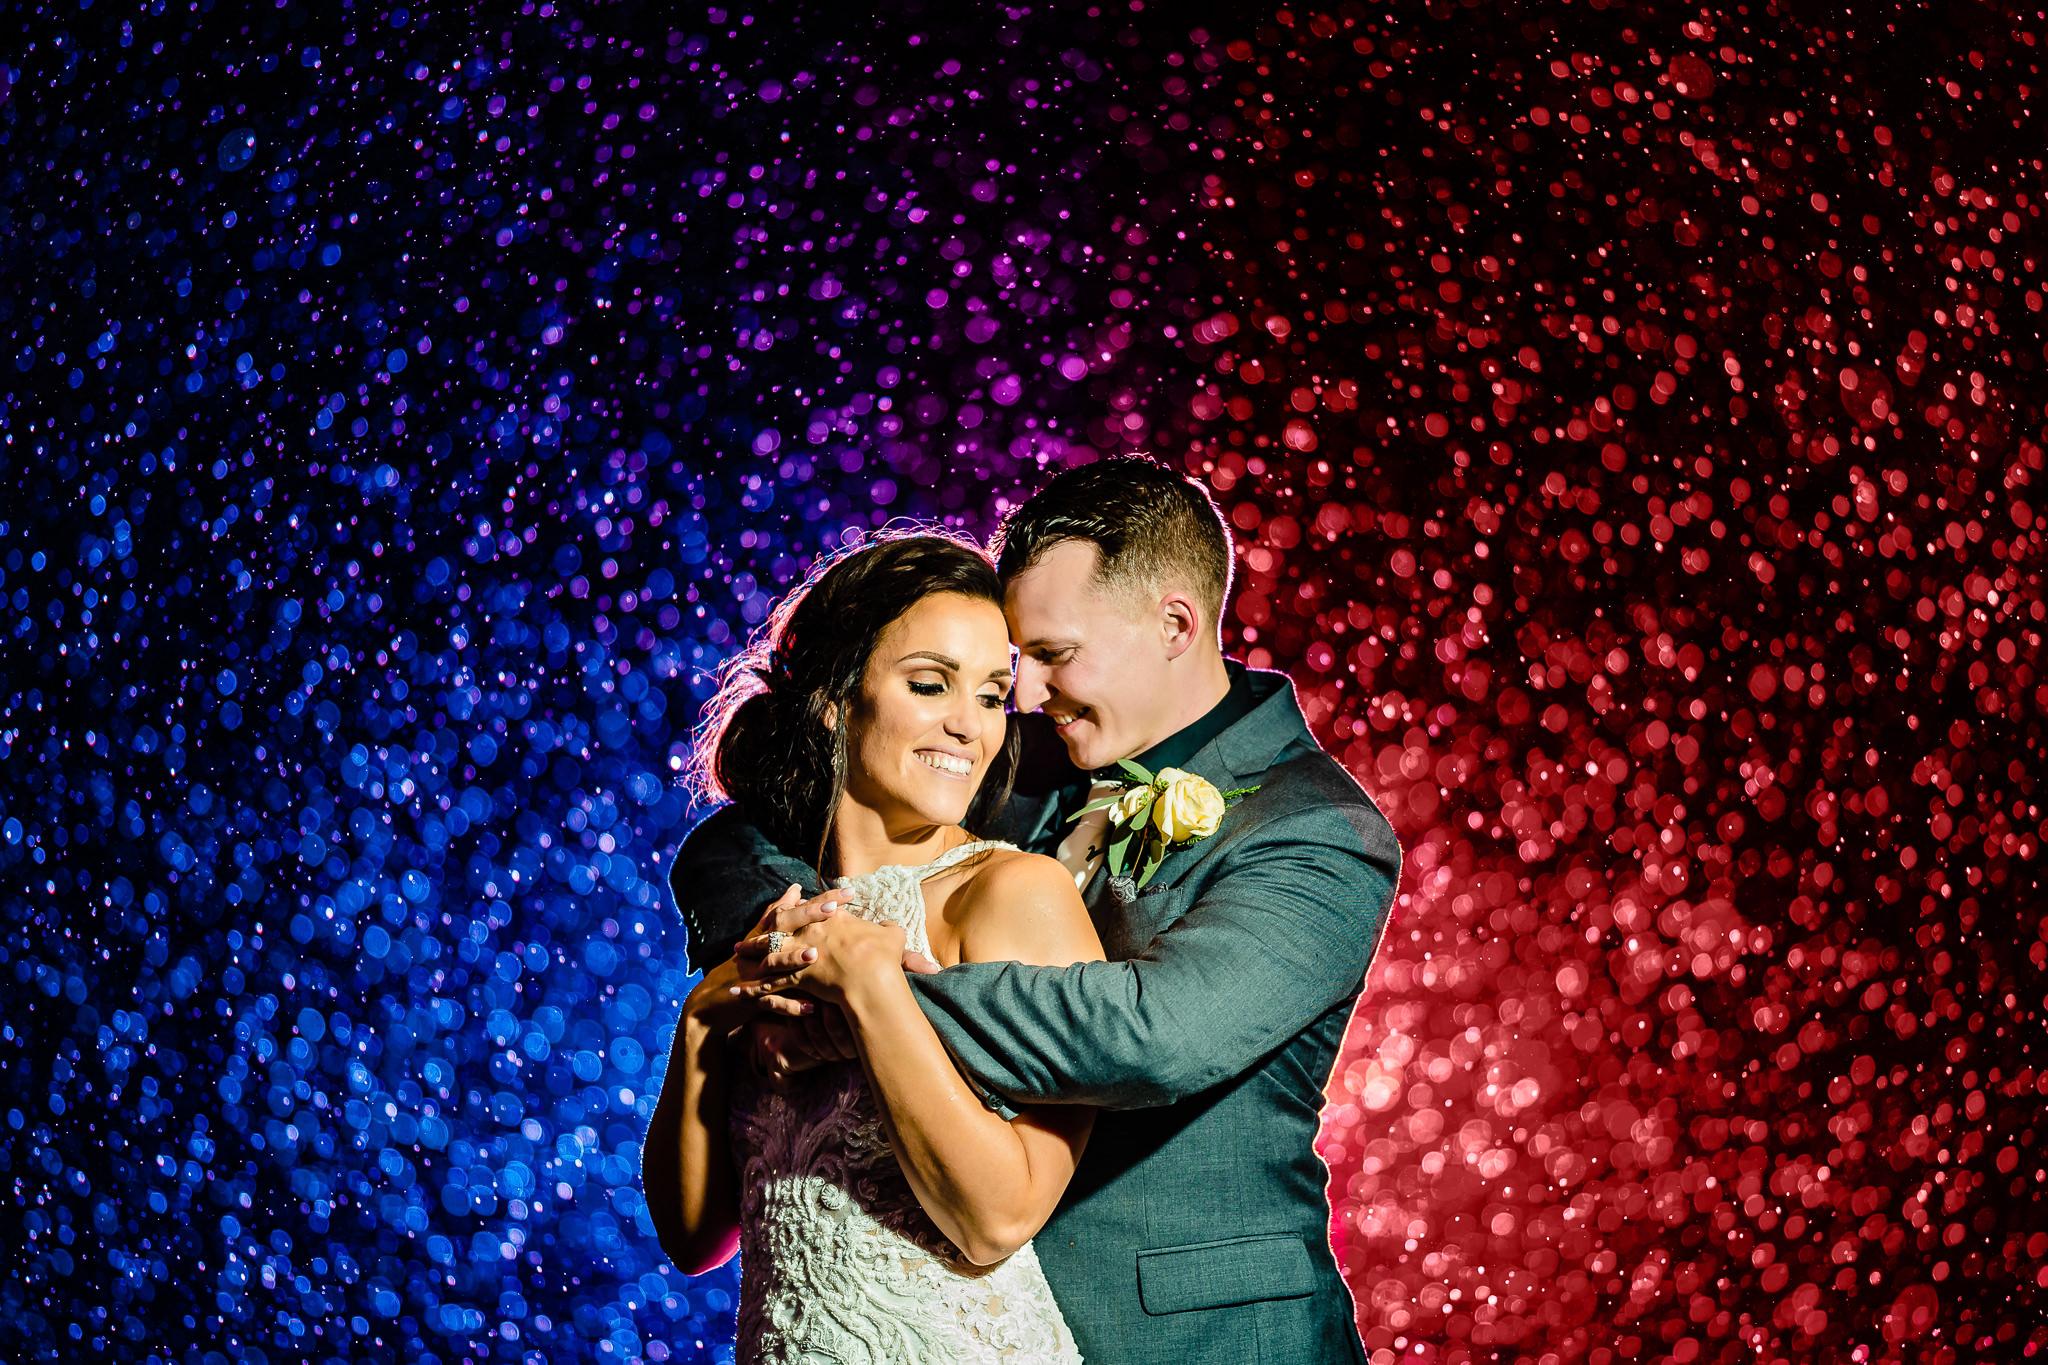 SMJ Photography, Wedding Photography, Husband and WIfe Wedding Photo, High Contrast Photography, Colorful Wedding Photographer